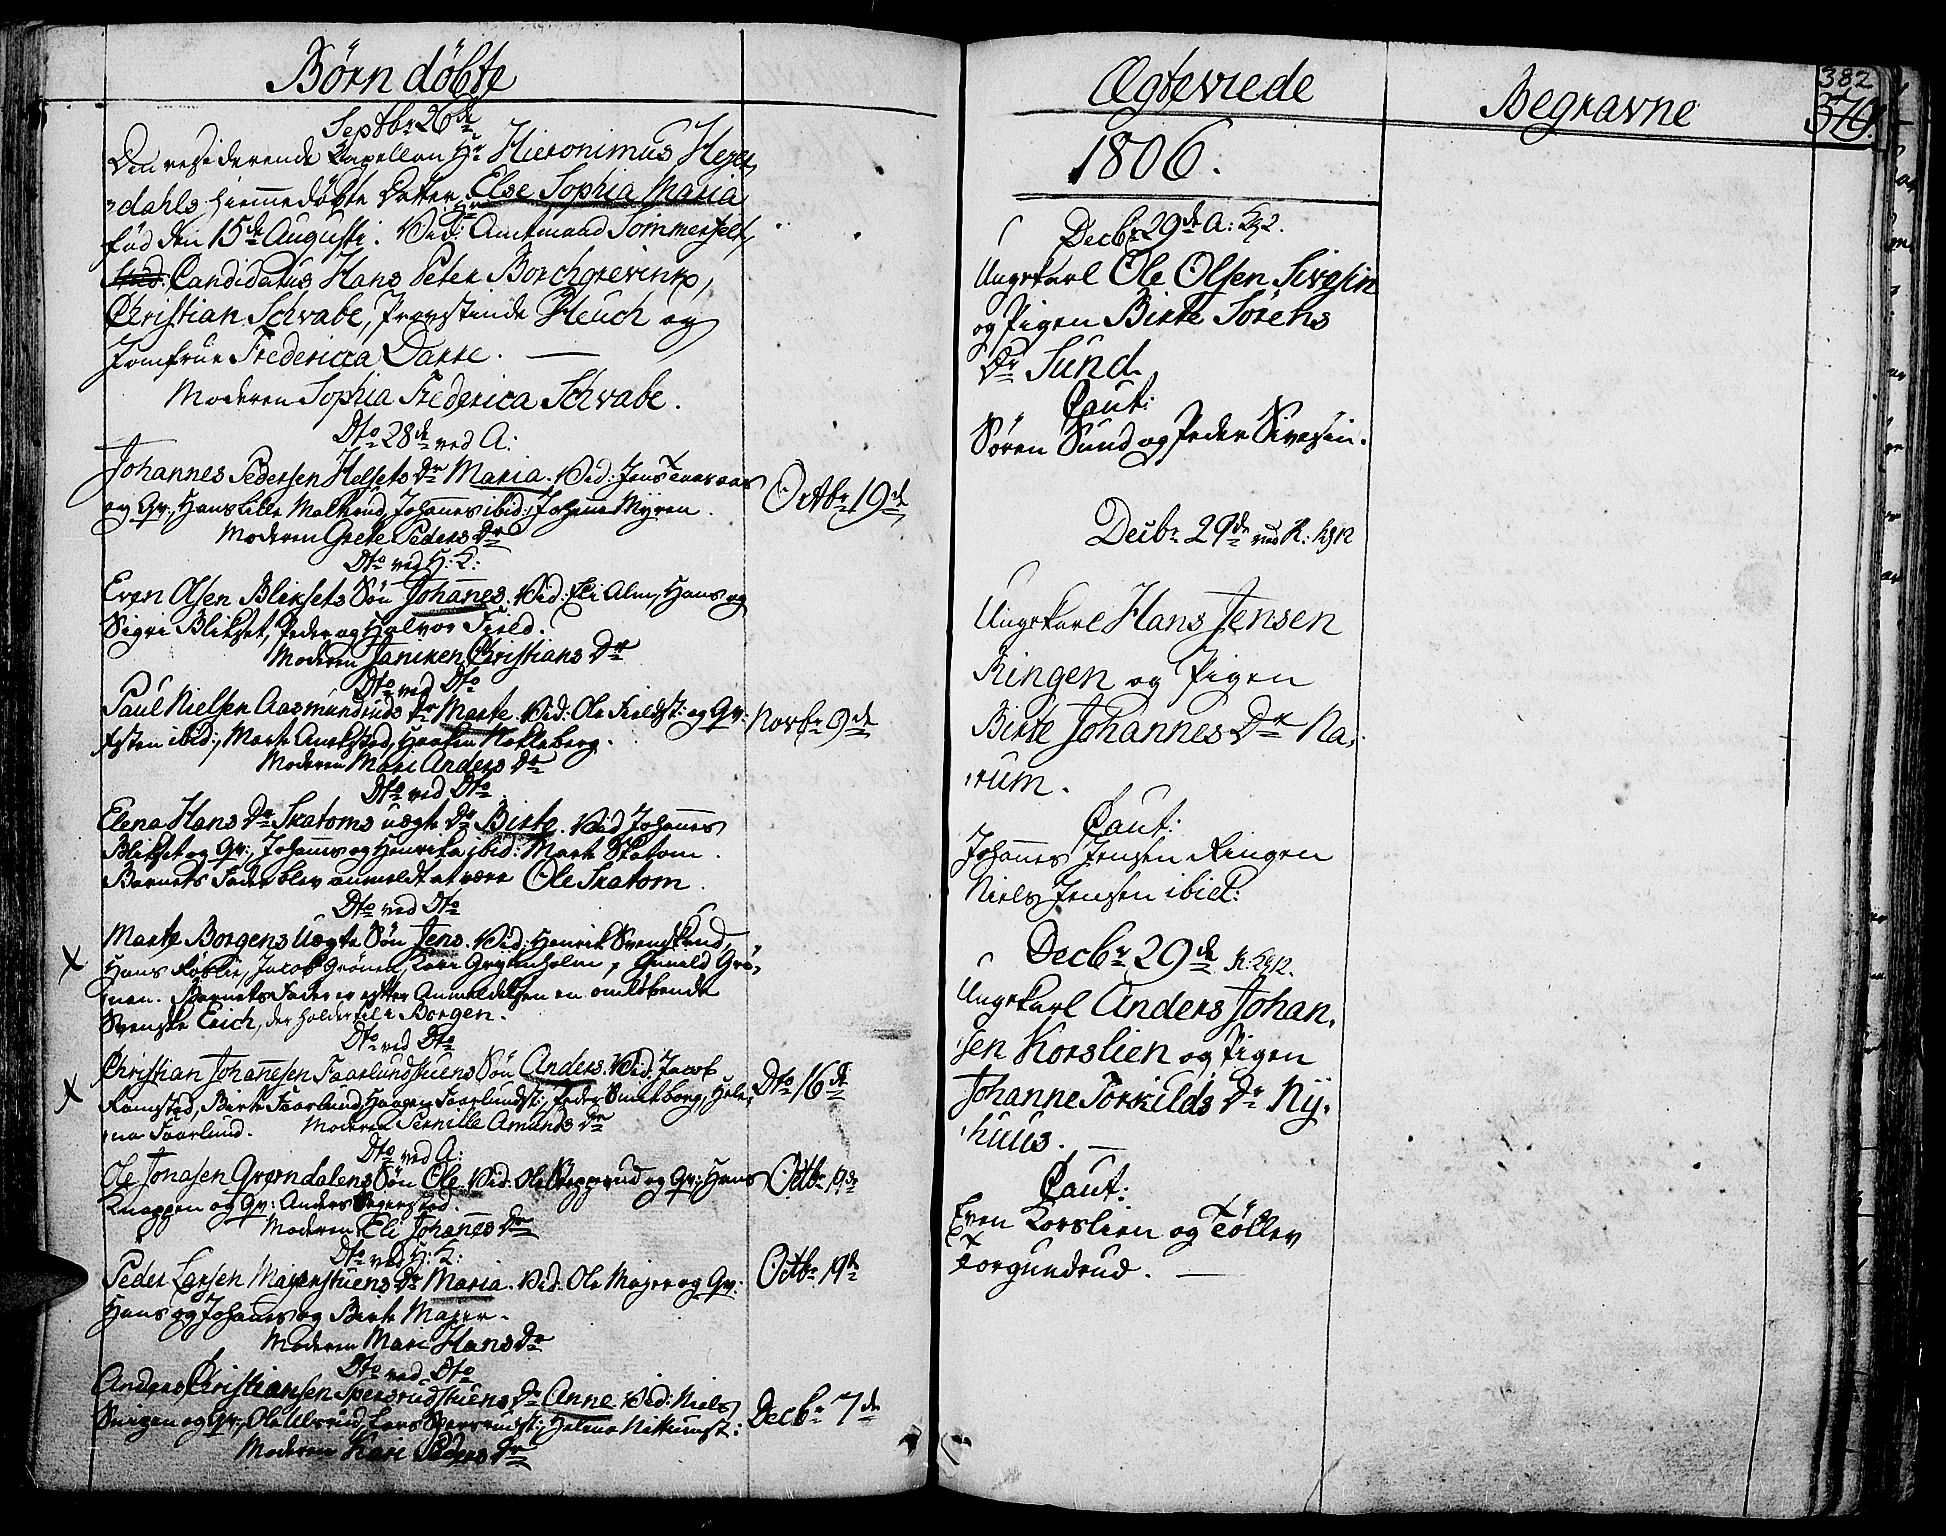 SAH, Toten prestekontor, Ministerialbok nr. 7, 1794-1809, s. 382